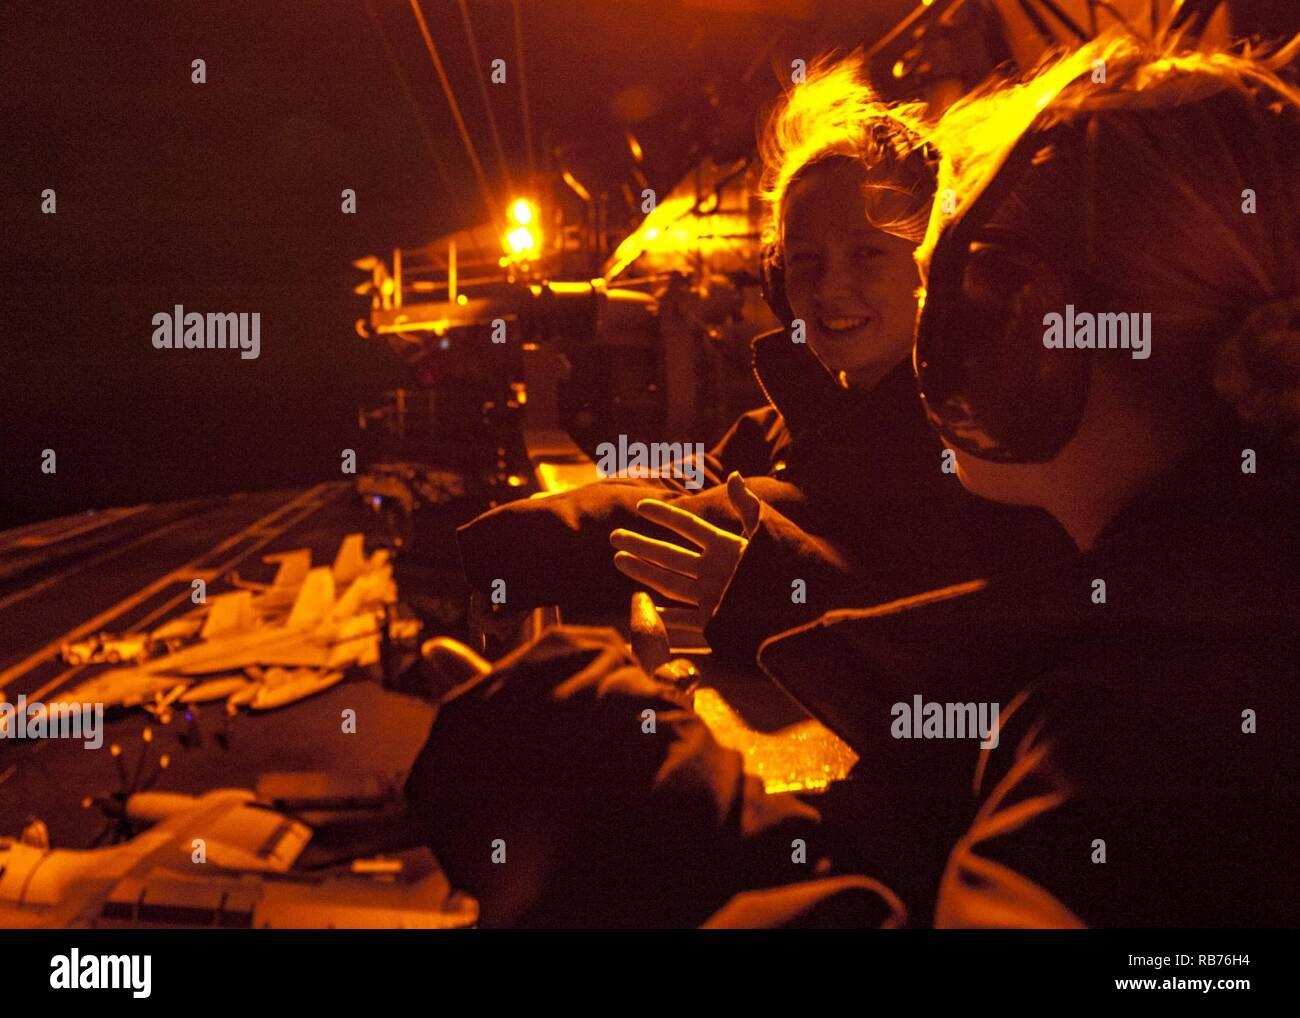 W Pickett Stock Photos & W Pickett Stock Images - Alamy